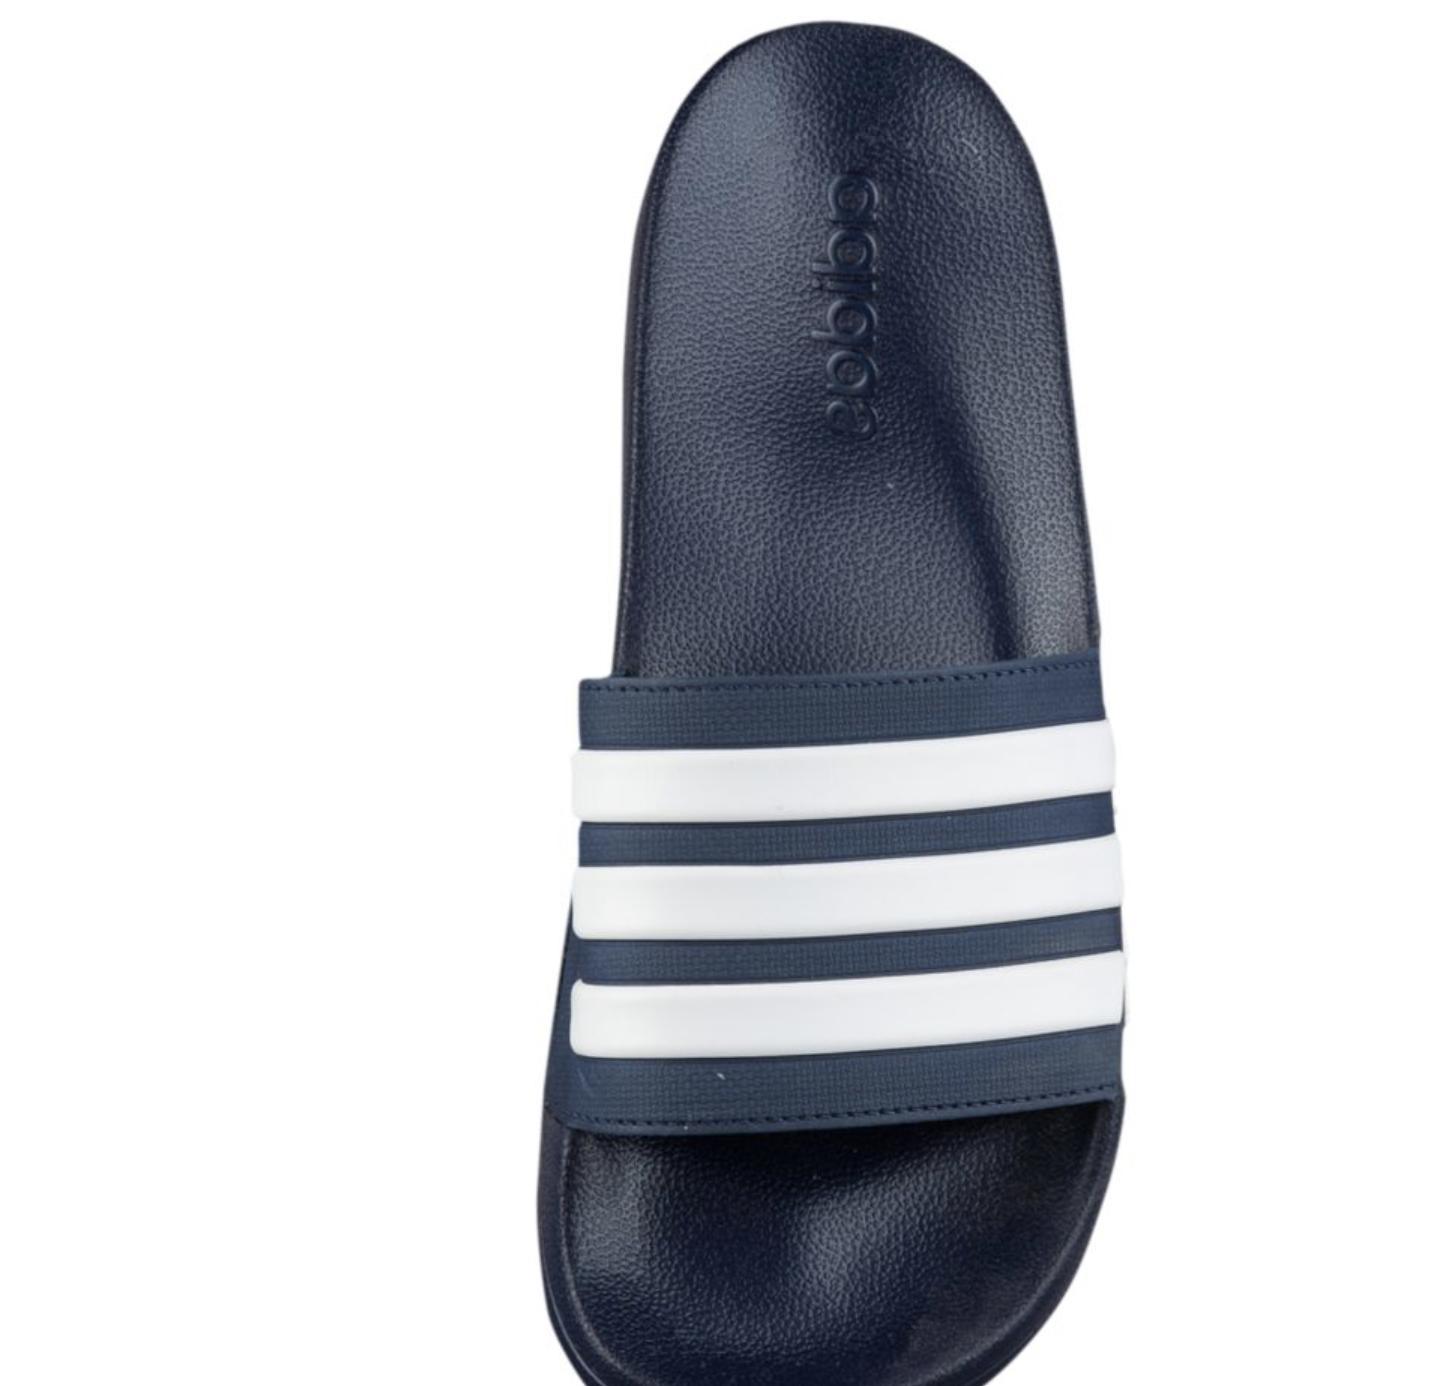 New adidas CloudFoam Blue Sport Slippers